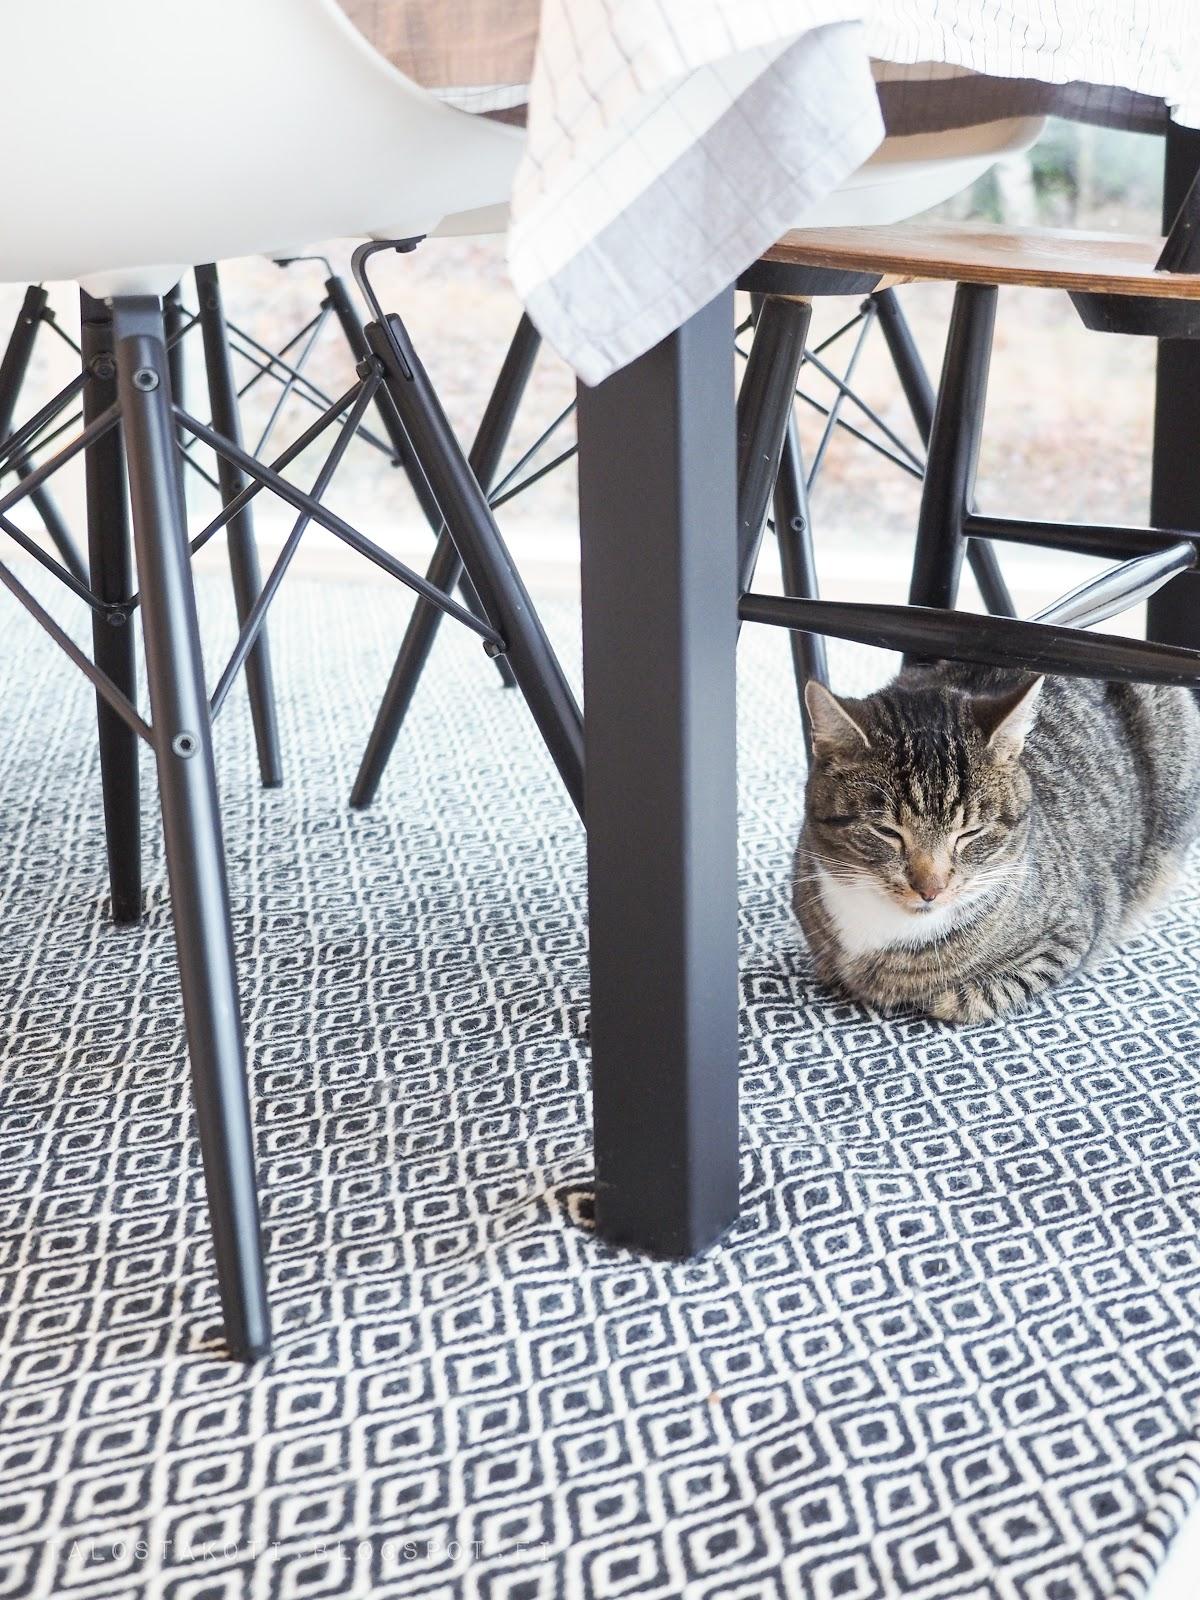 Joulu, kissa pöydän alla